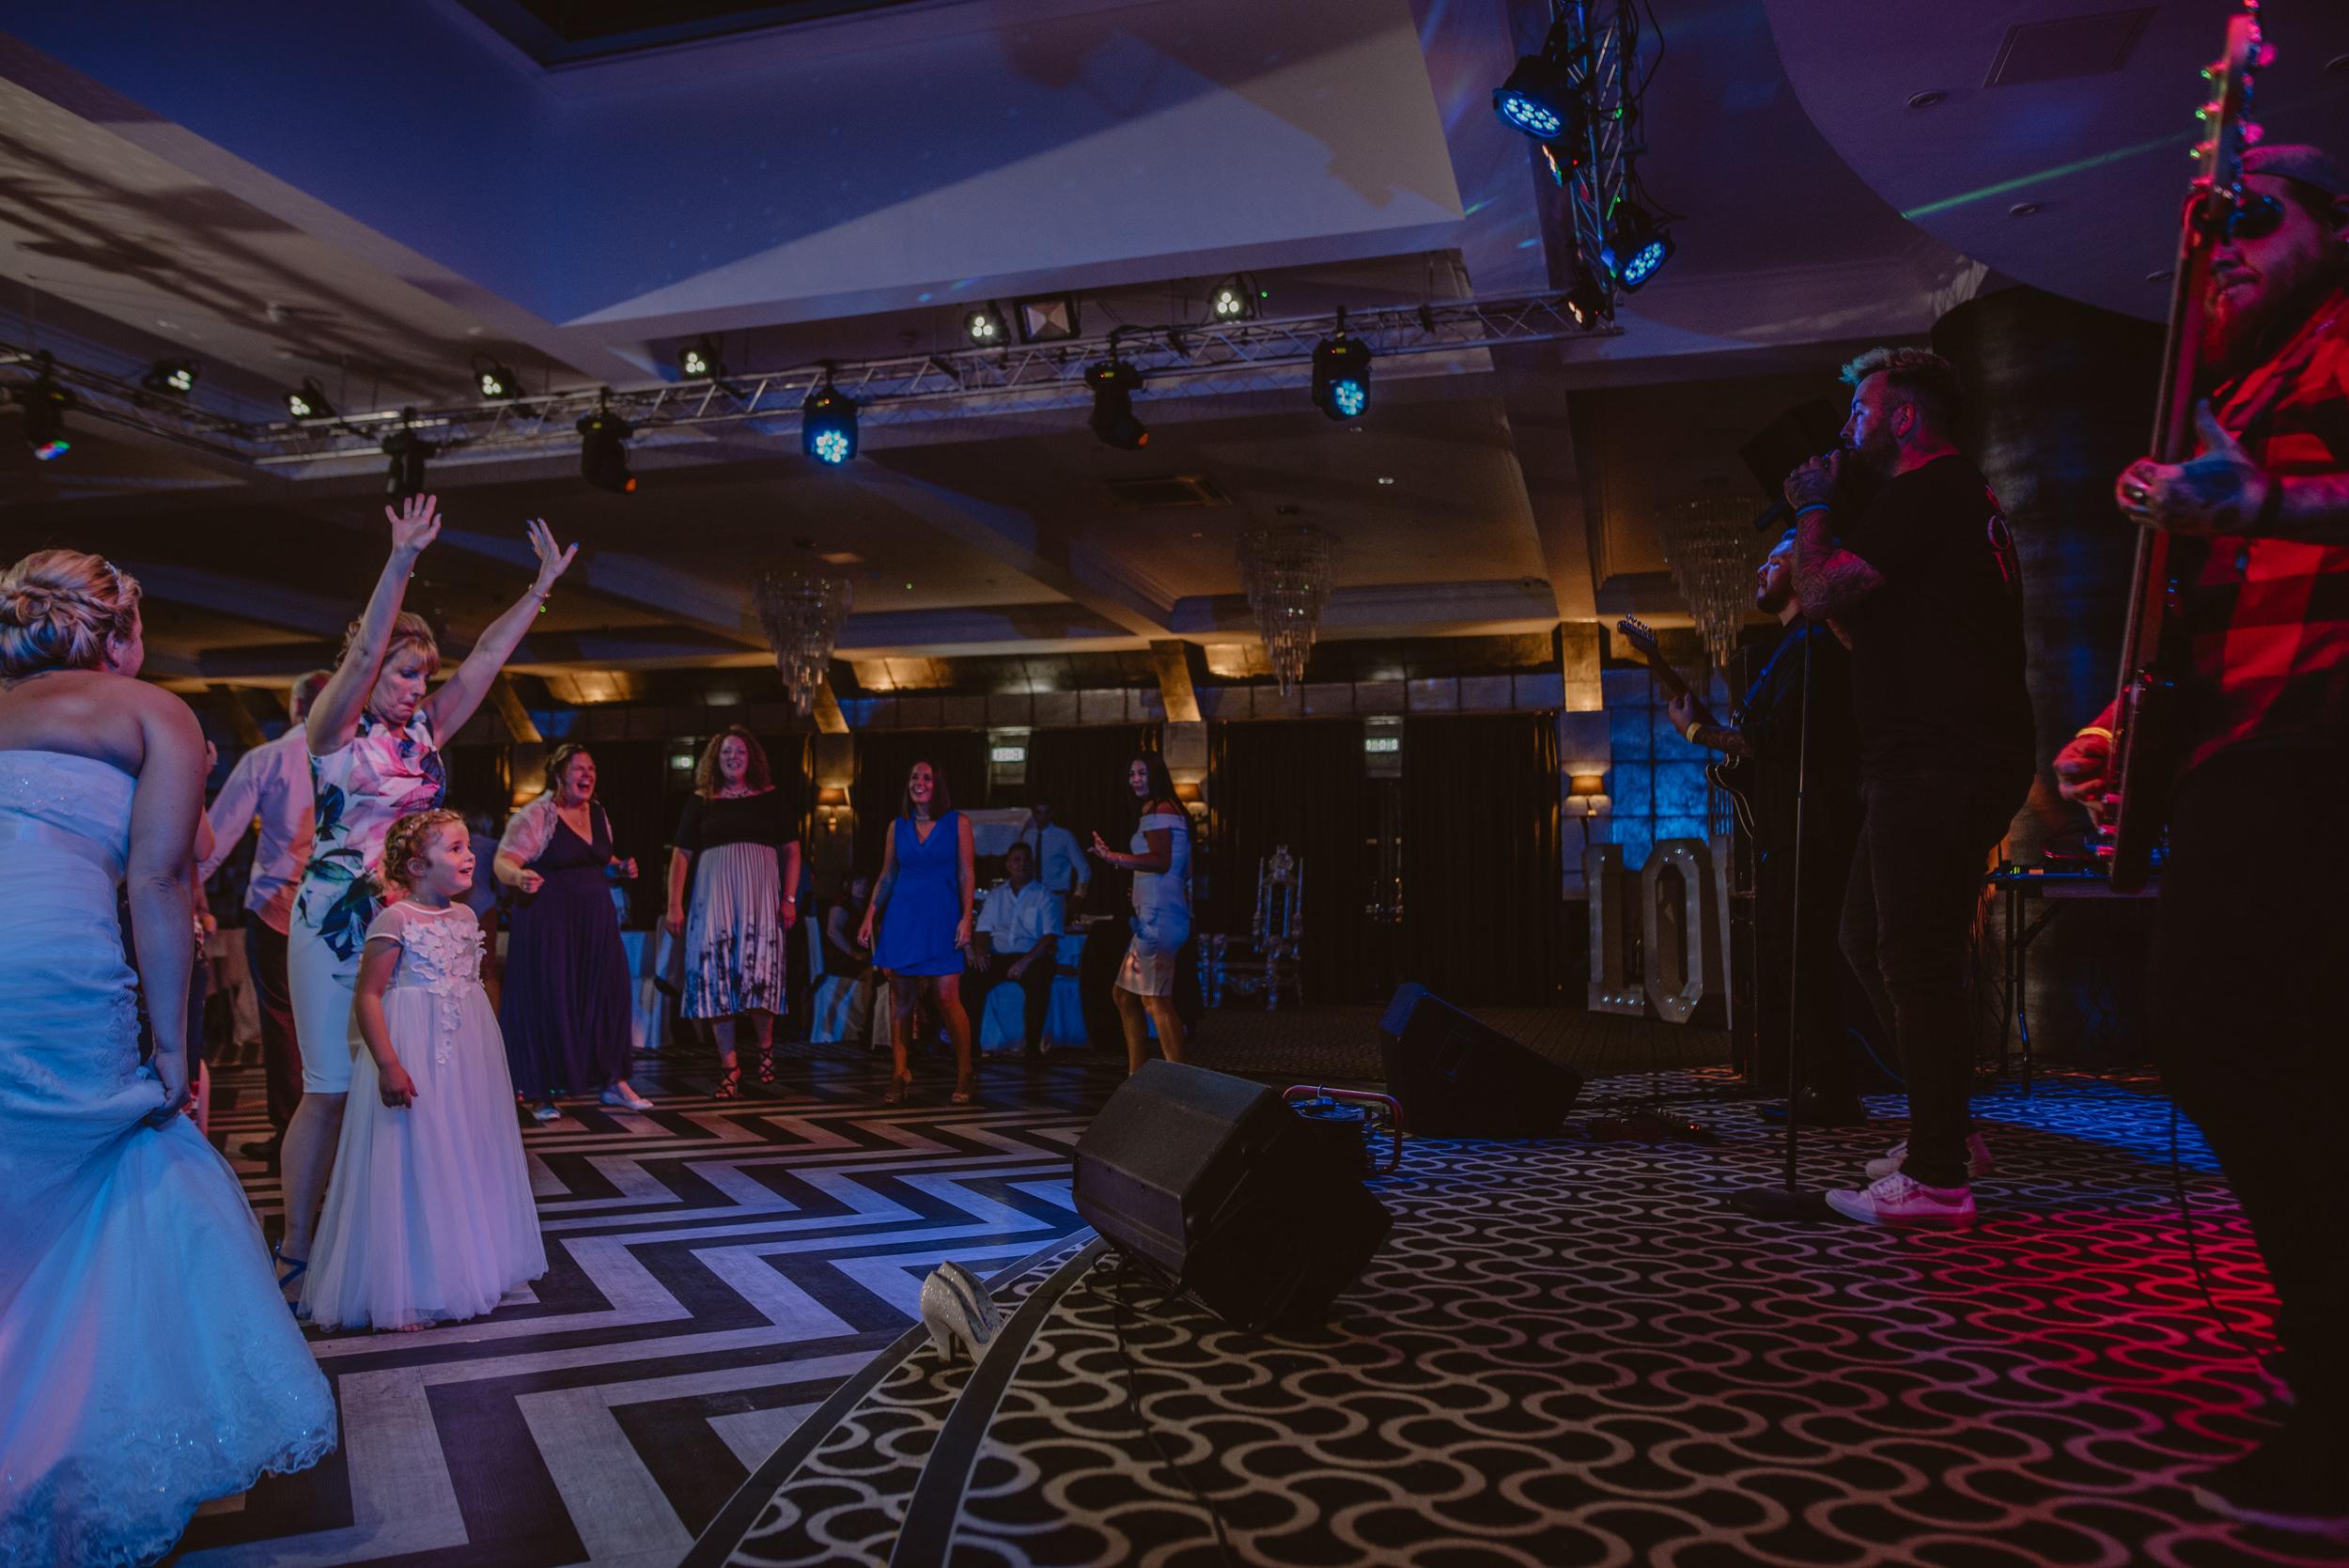 Chantelle-and-Stephen-Old-Thorns-Hotel-Wedding-Liphook-Manu-Mendoza-Wedding-Photography-603.jpg